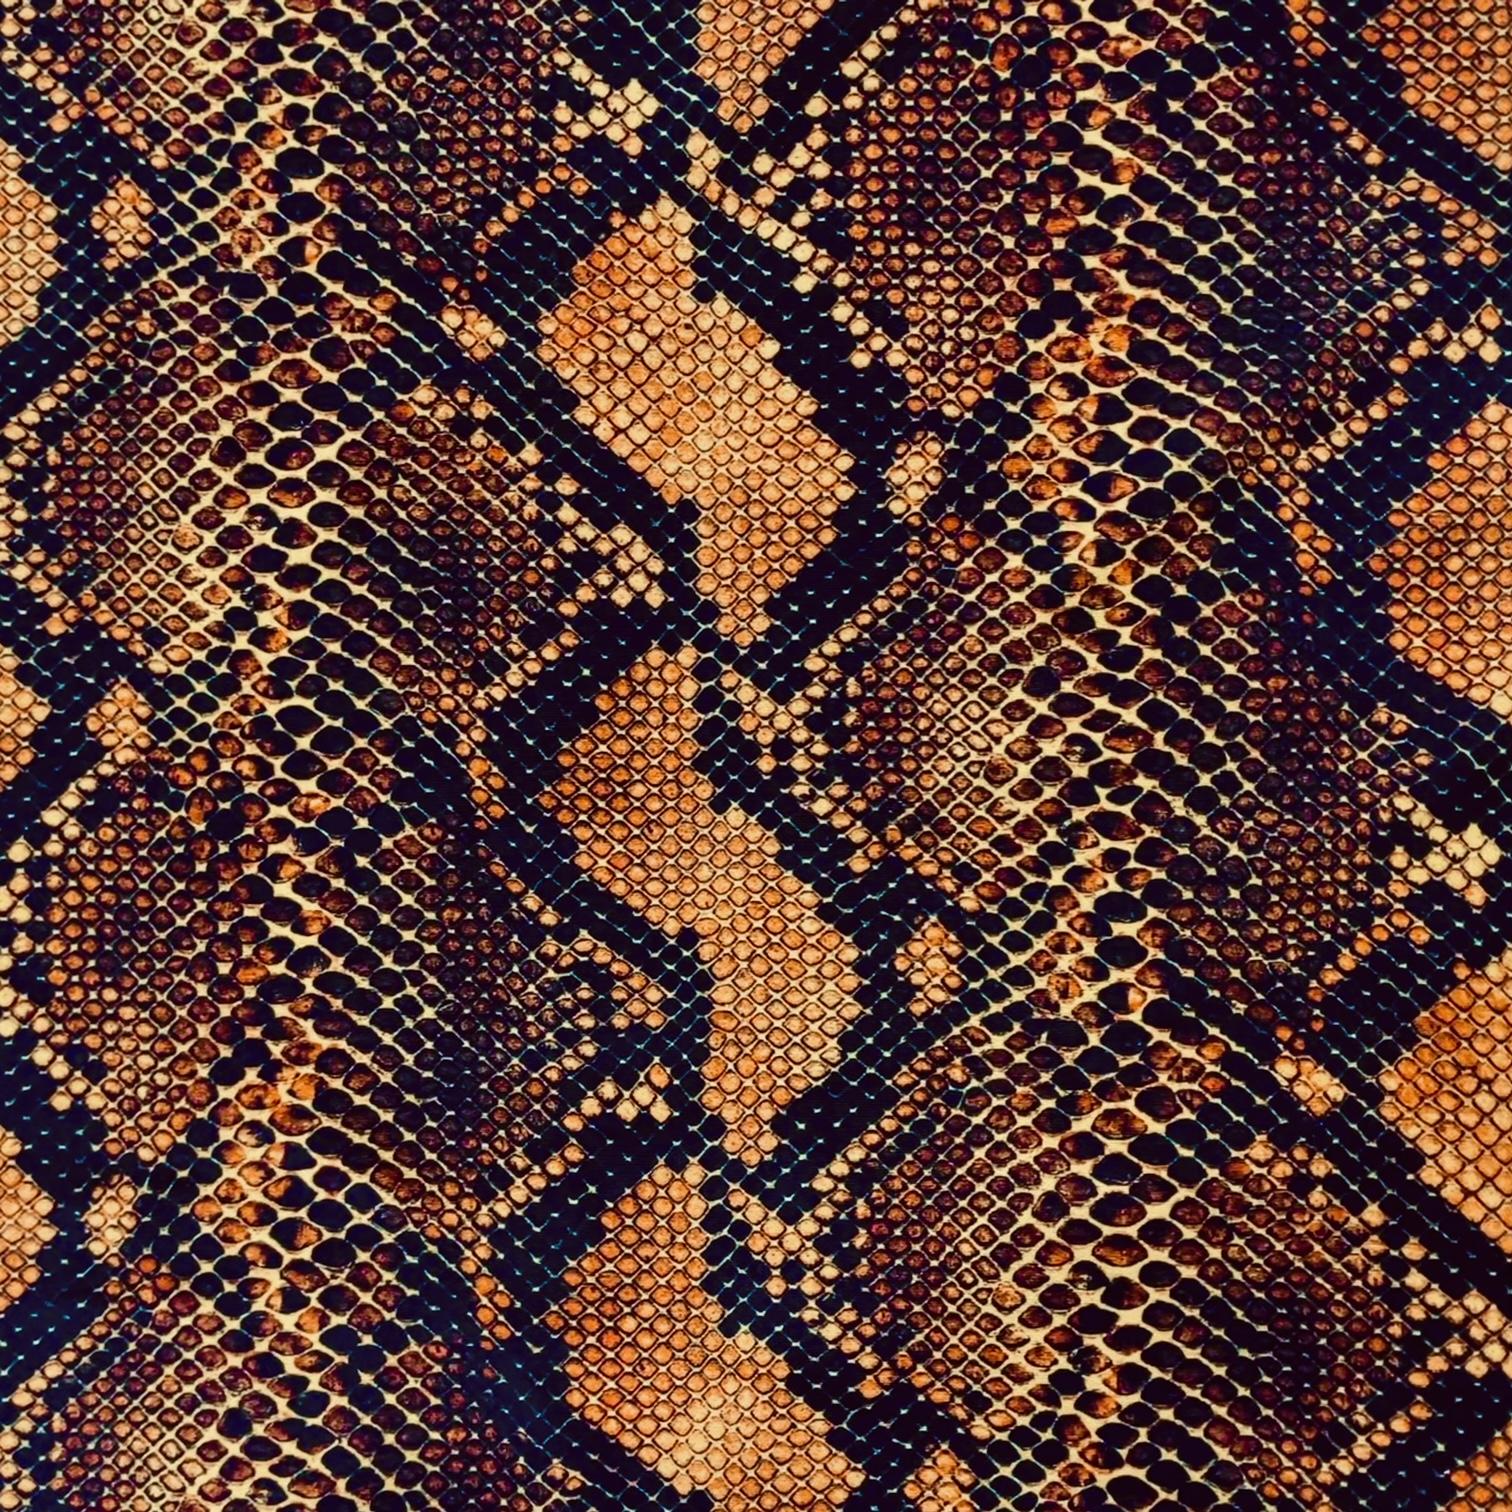 gold-snakeskin-cropped.jpeg